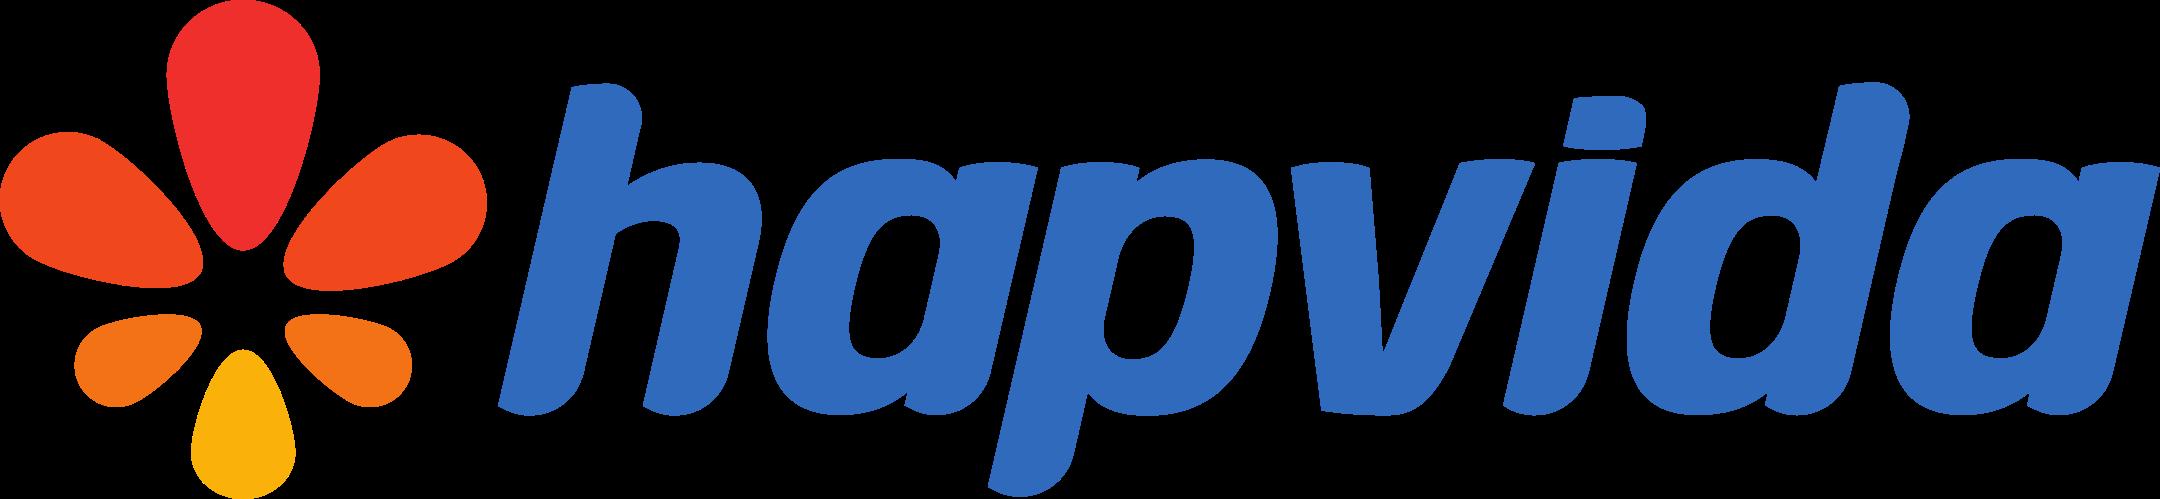 hapvida logo 1 - Hapvida logo